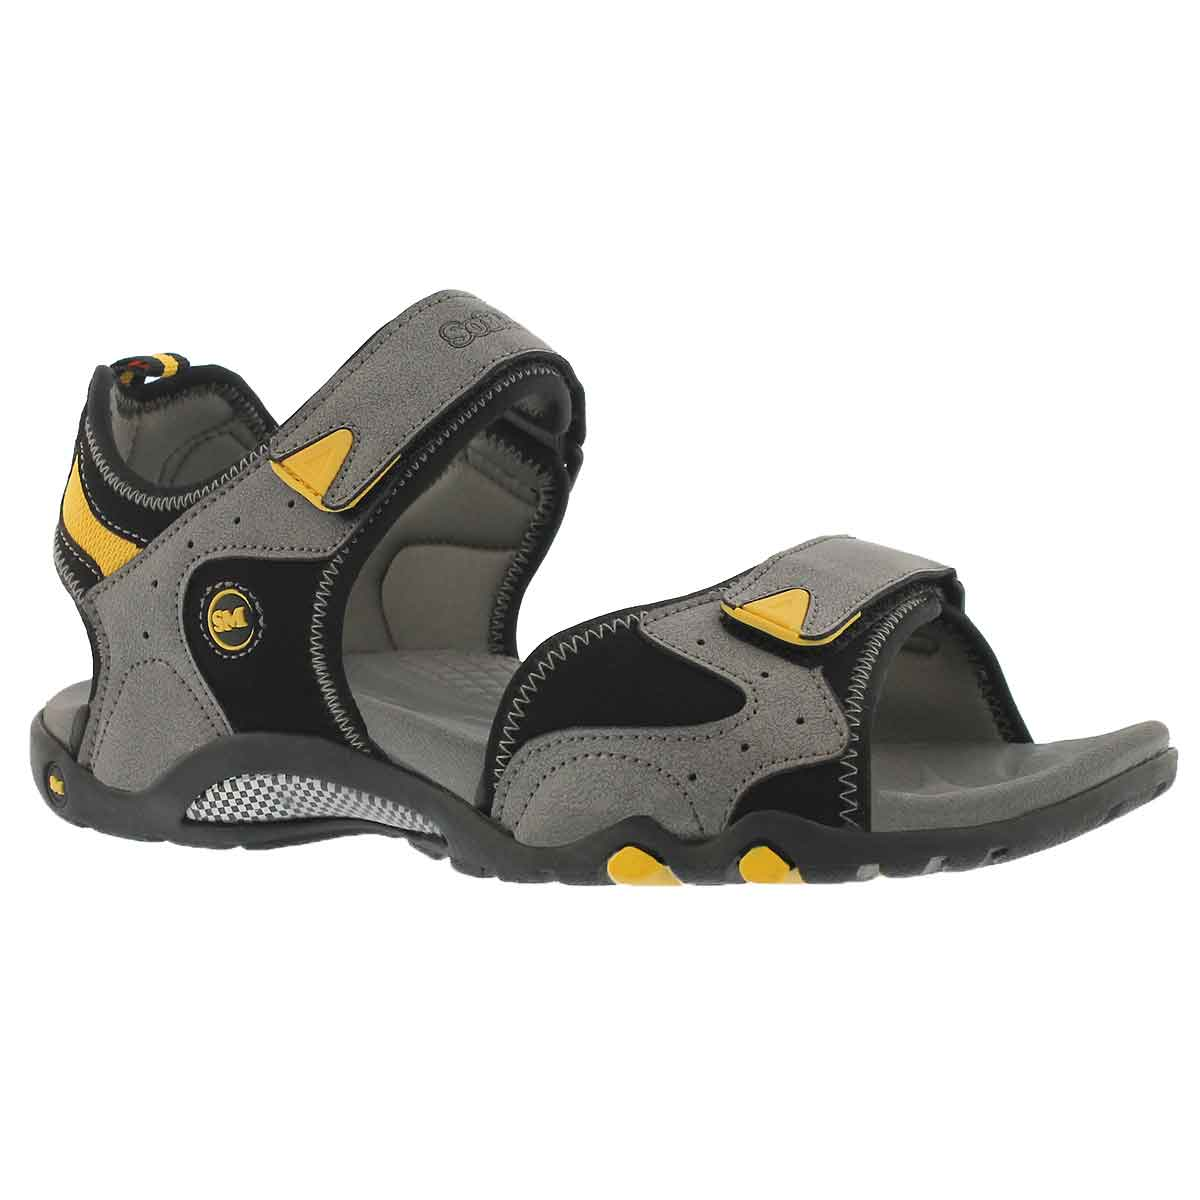 Sandale sport 3 sangles Kedge, gris, hom